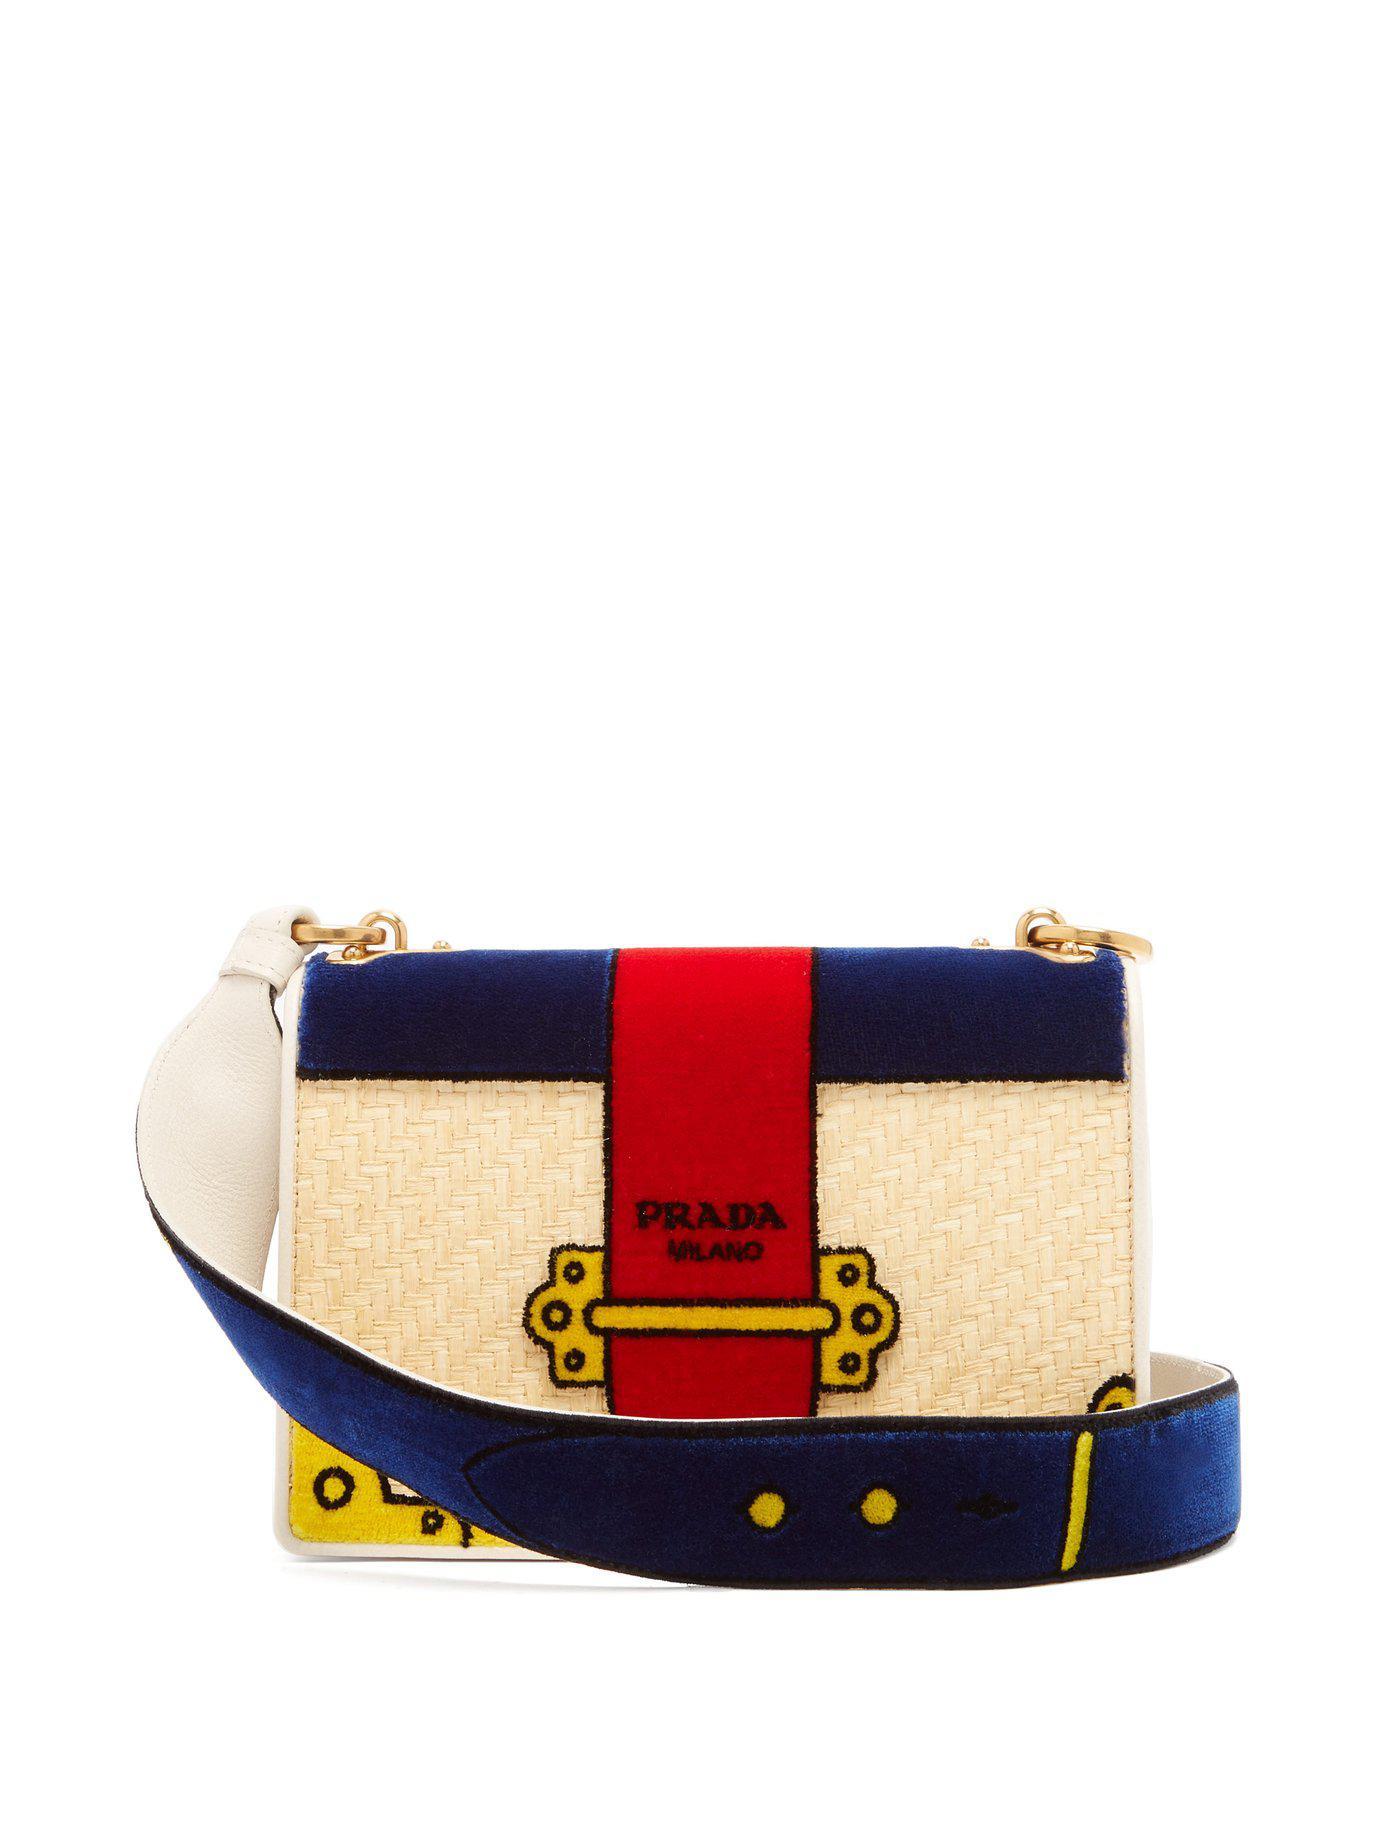 131261917c7c Lyst - Prada Cartoon Velvet Cross-body Bag